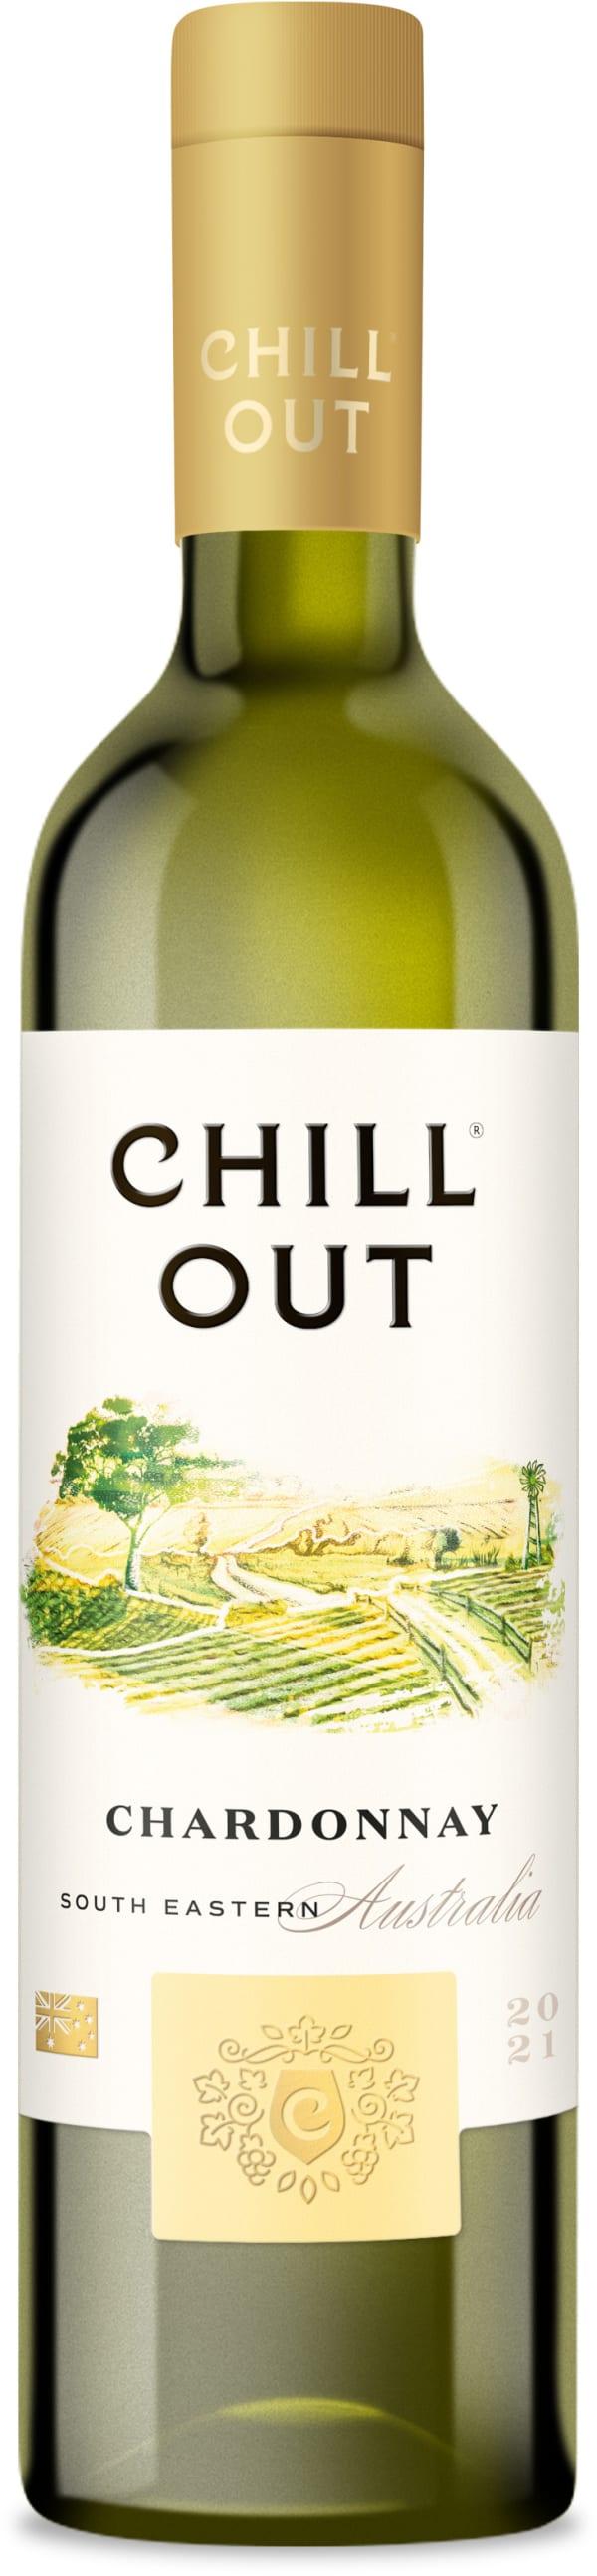 Chill Out Fresh & Fruity Chardonnay 2016 muovipullo